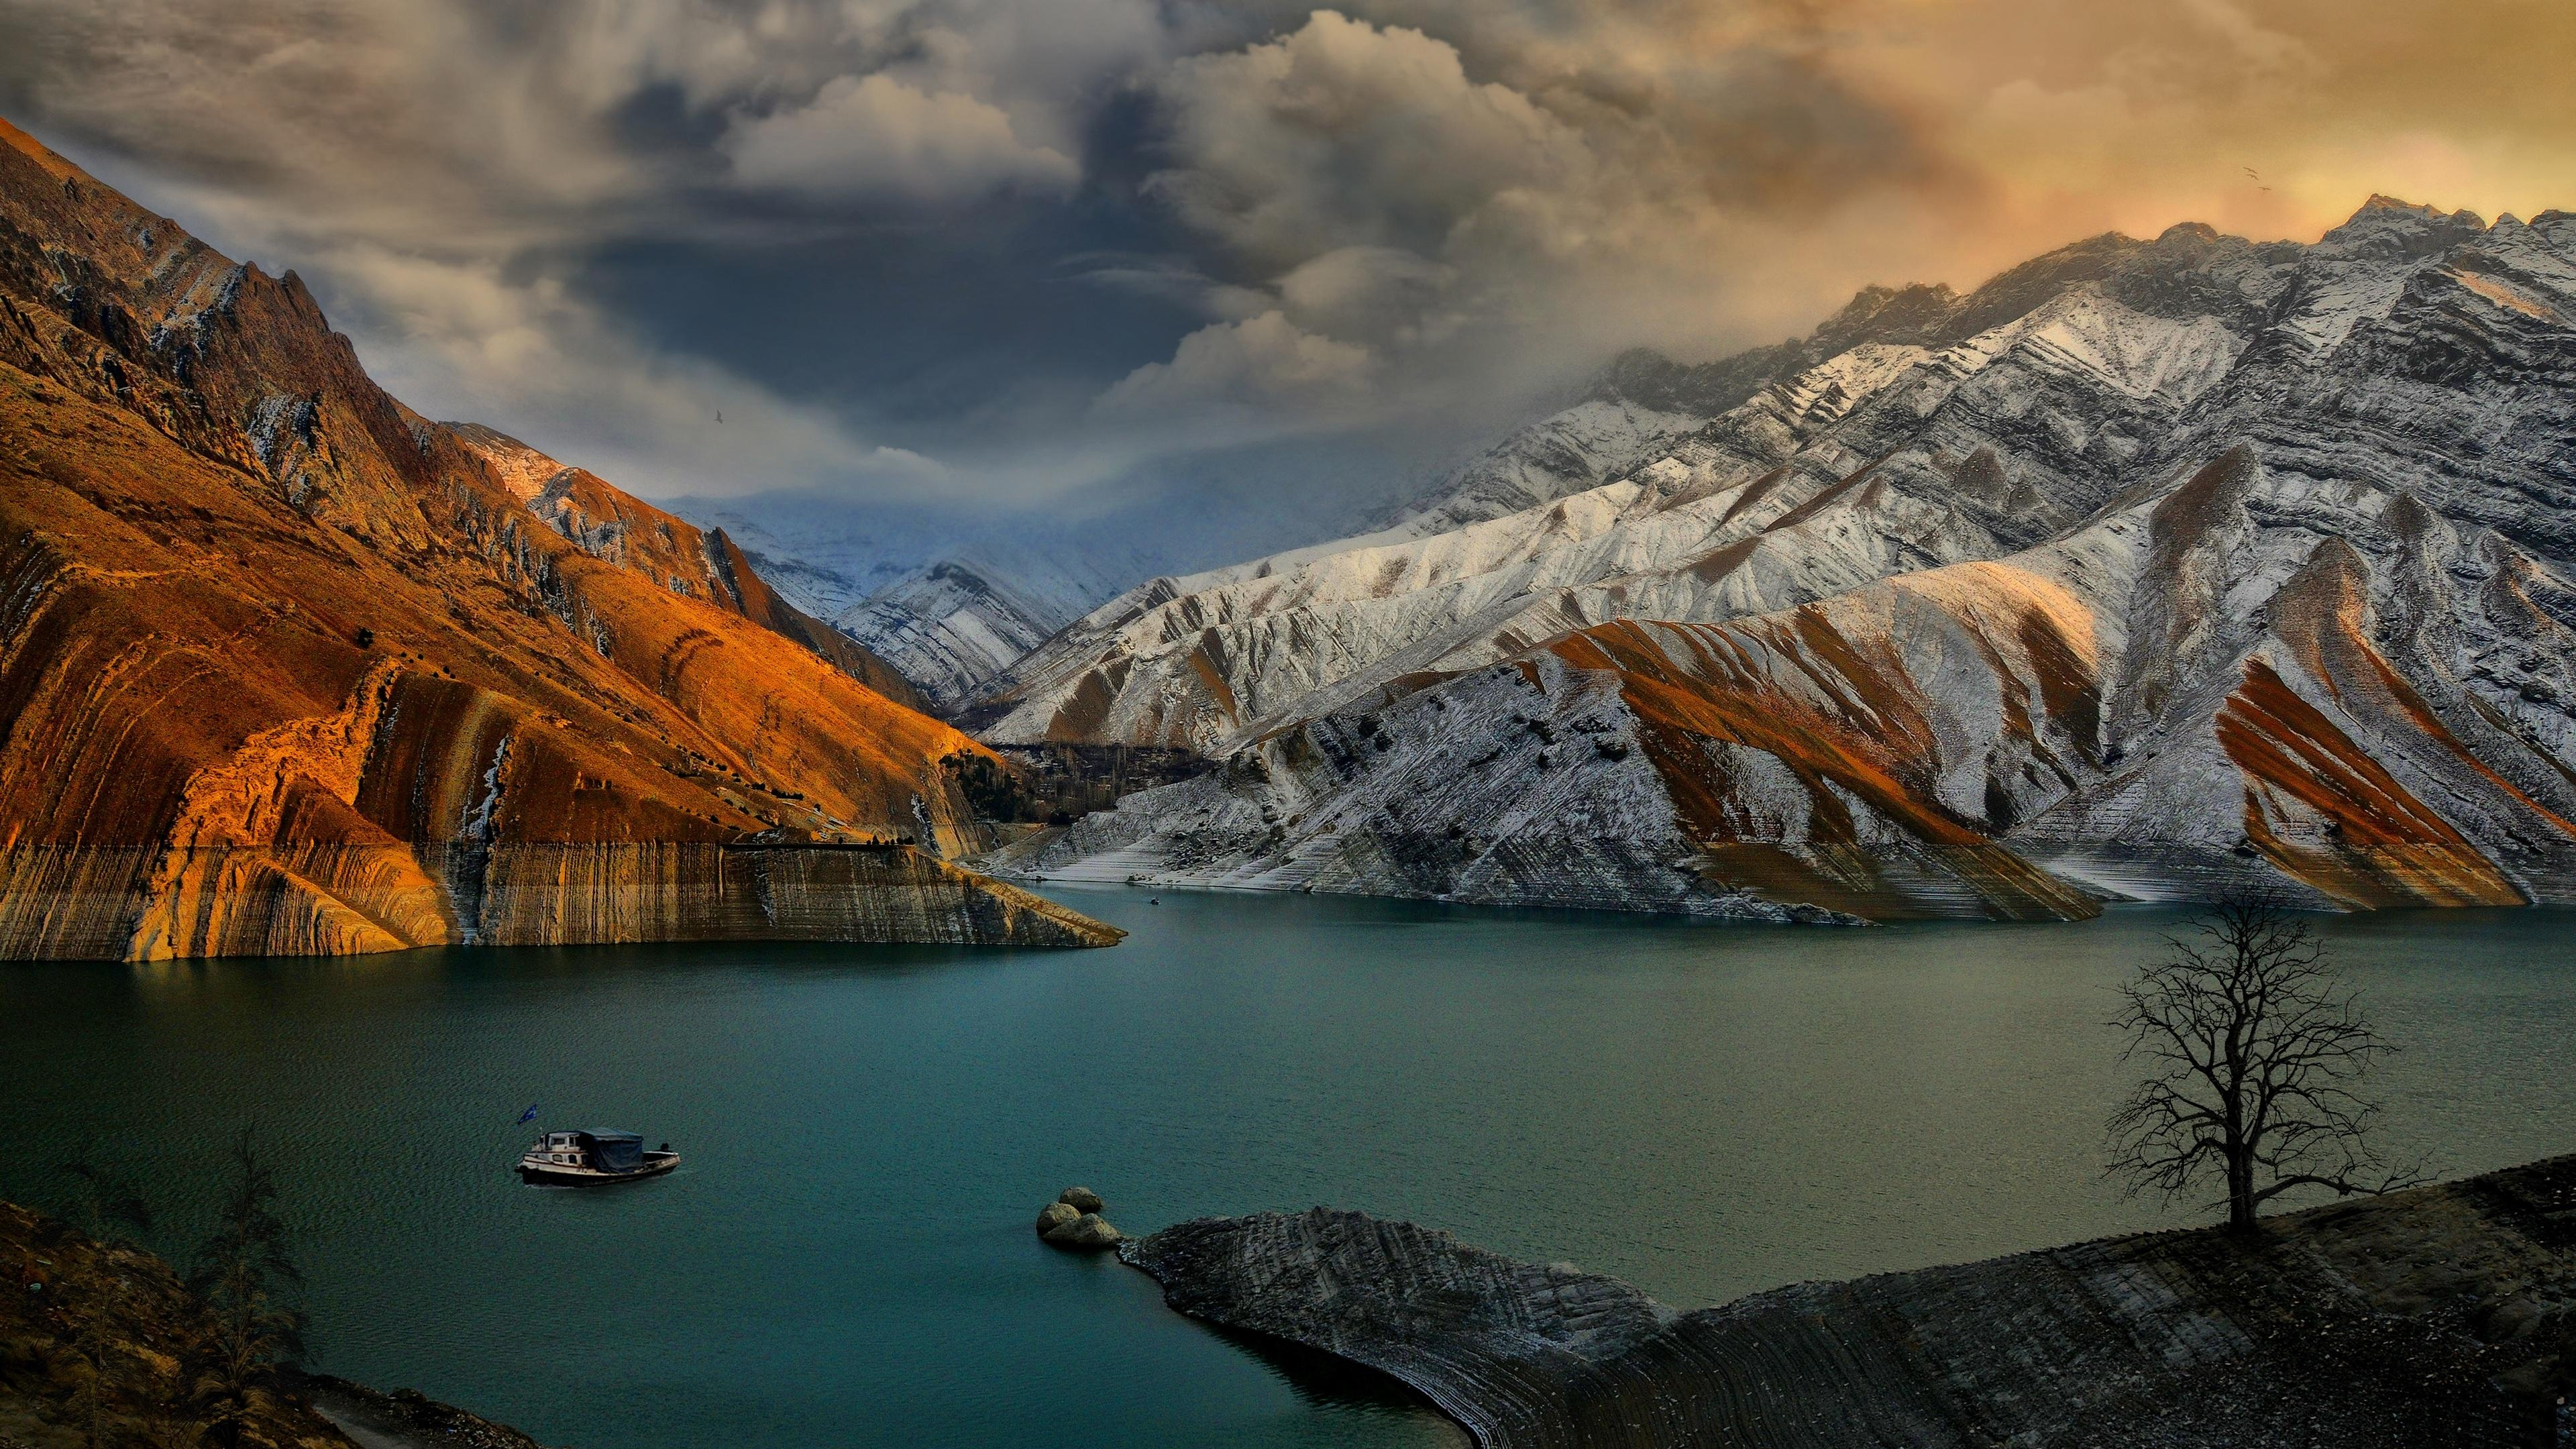 Amirkabir Dam Wallpapers   3840x2160   2975631 3840x2160